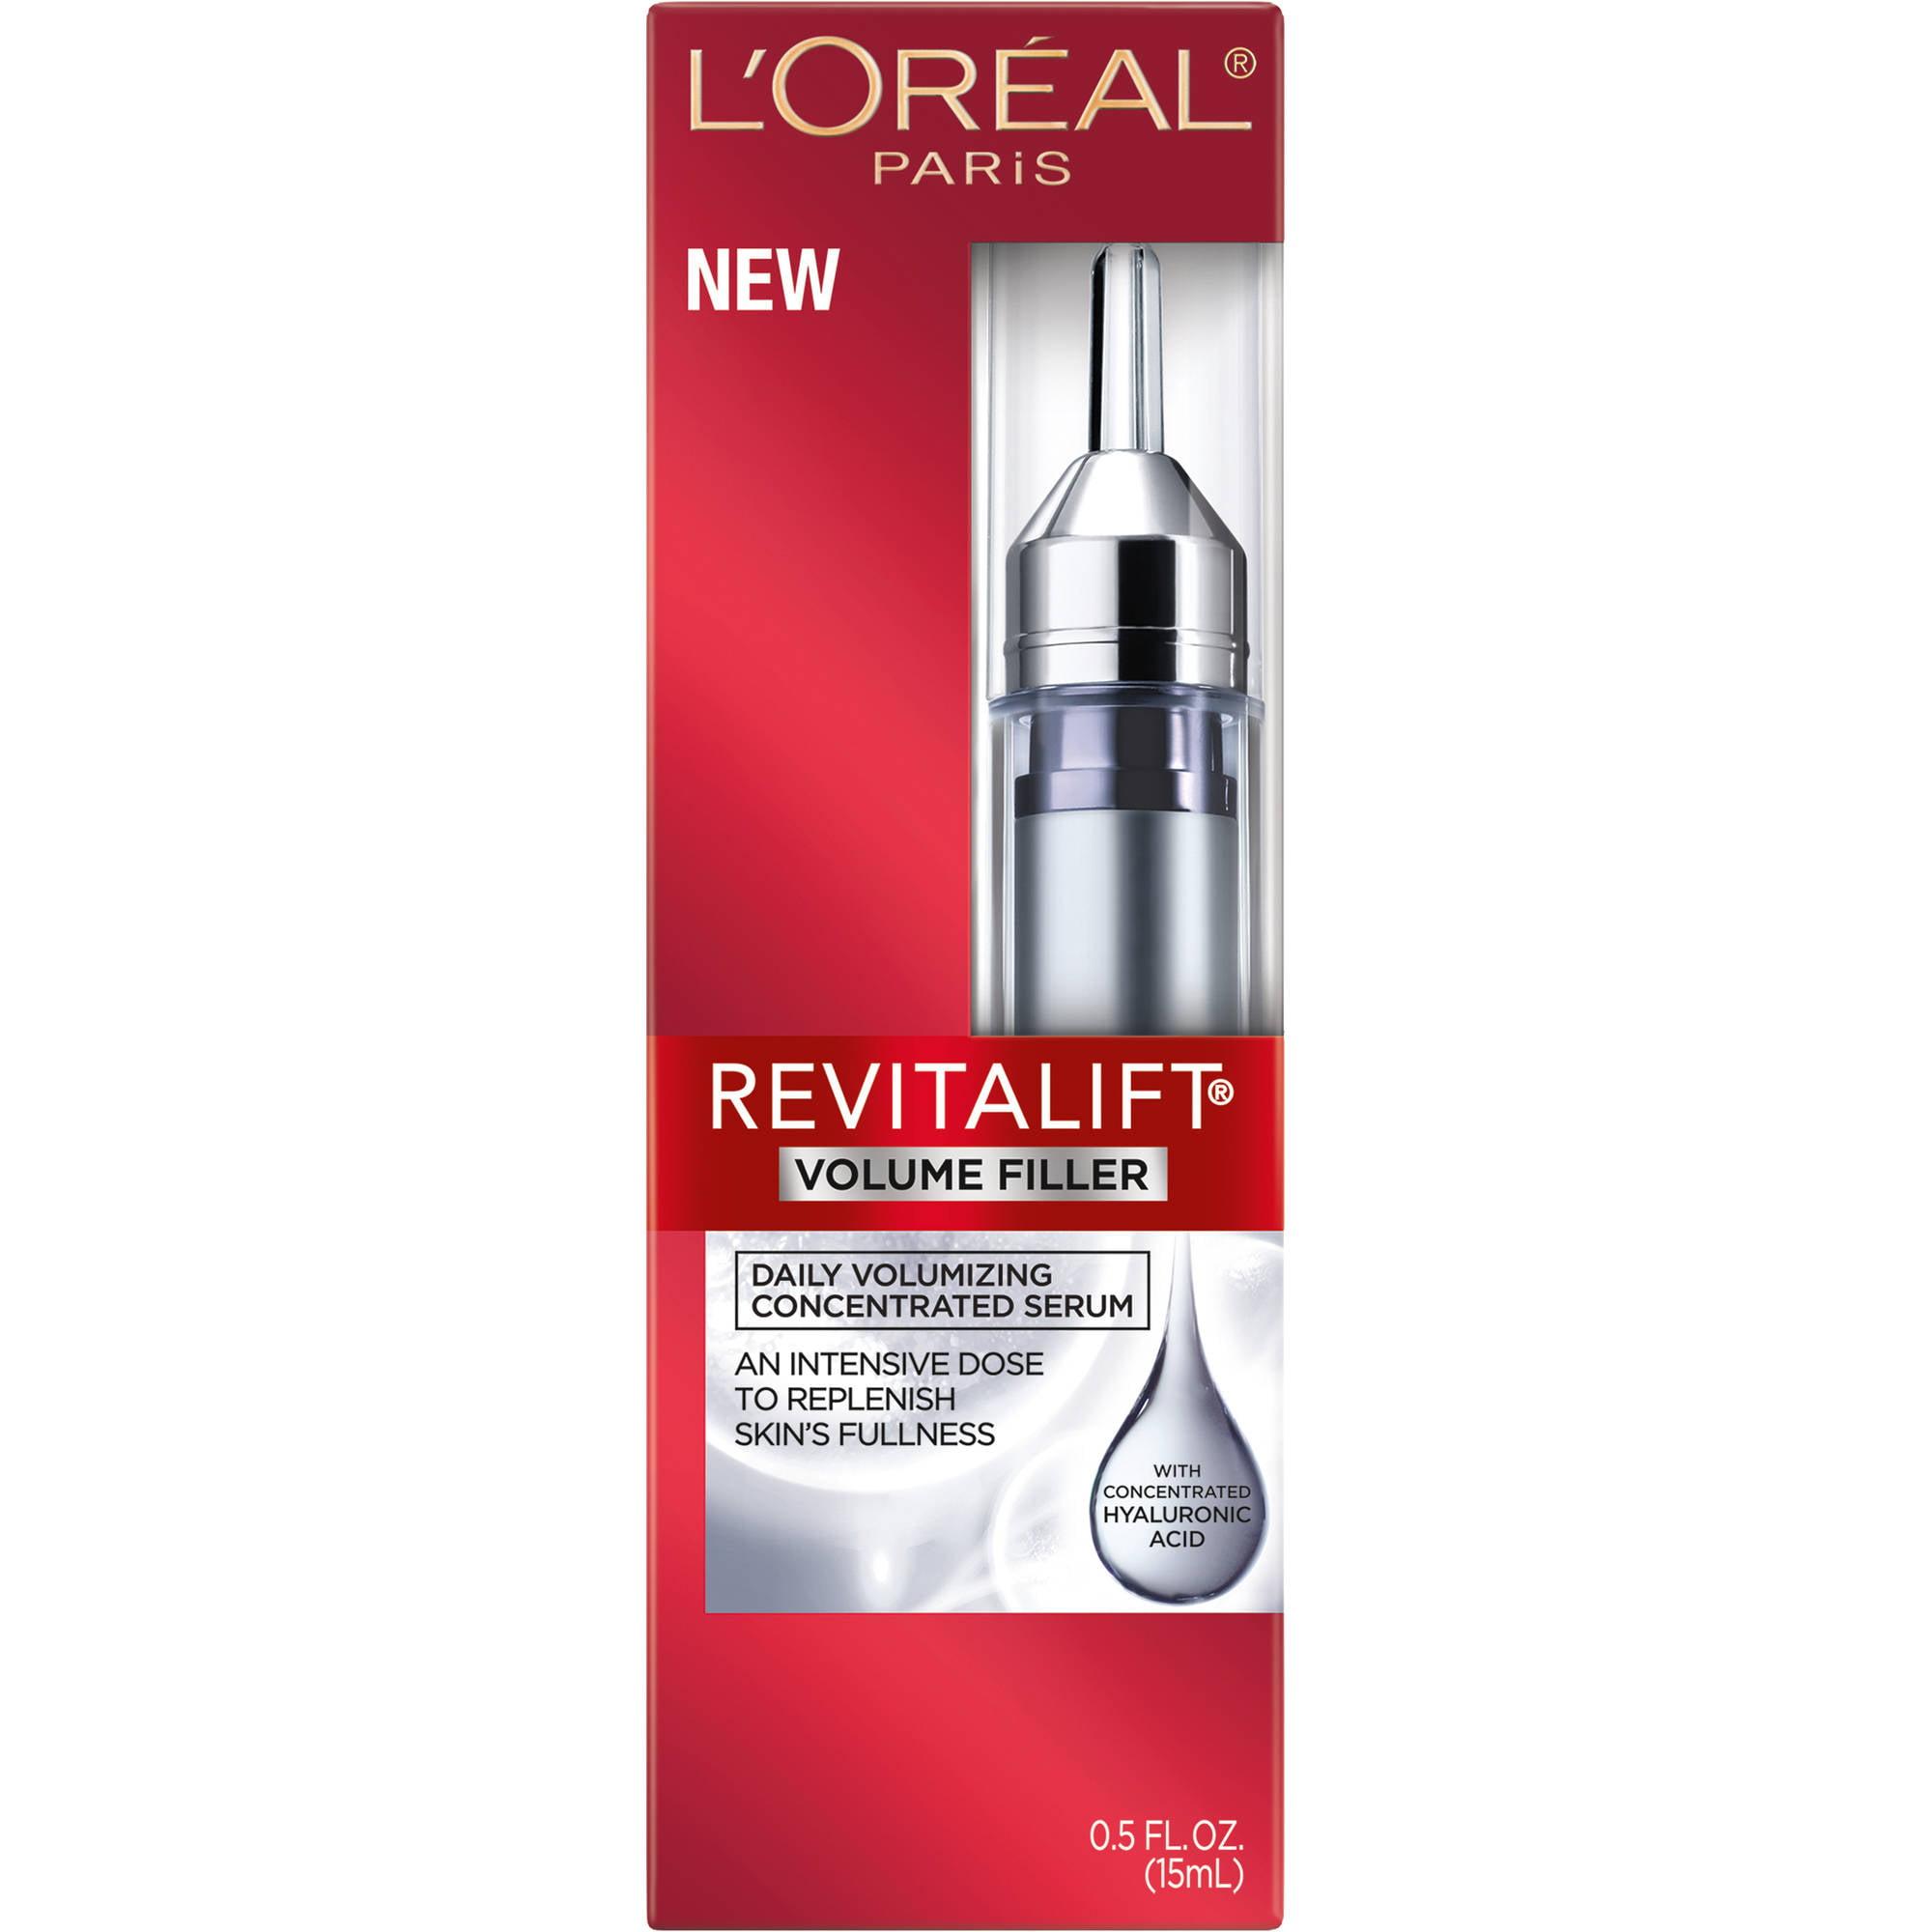 L'oreal eye makeup remover coupons - L Oreal Paris Hair Expertise Product Printable Coupon L Oreal Paris Revitalift Volume Filler Serum 0 5 Fl Oz Com Makeup Ideas